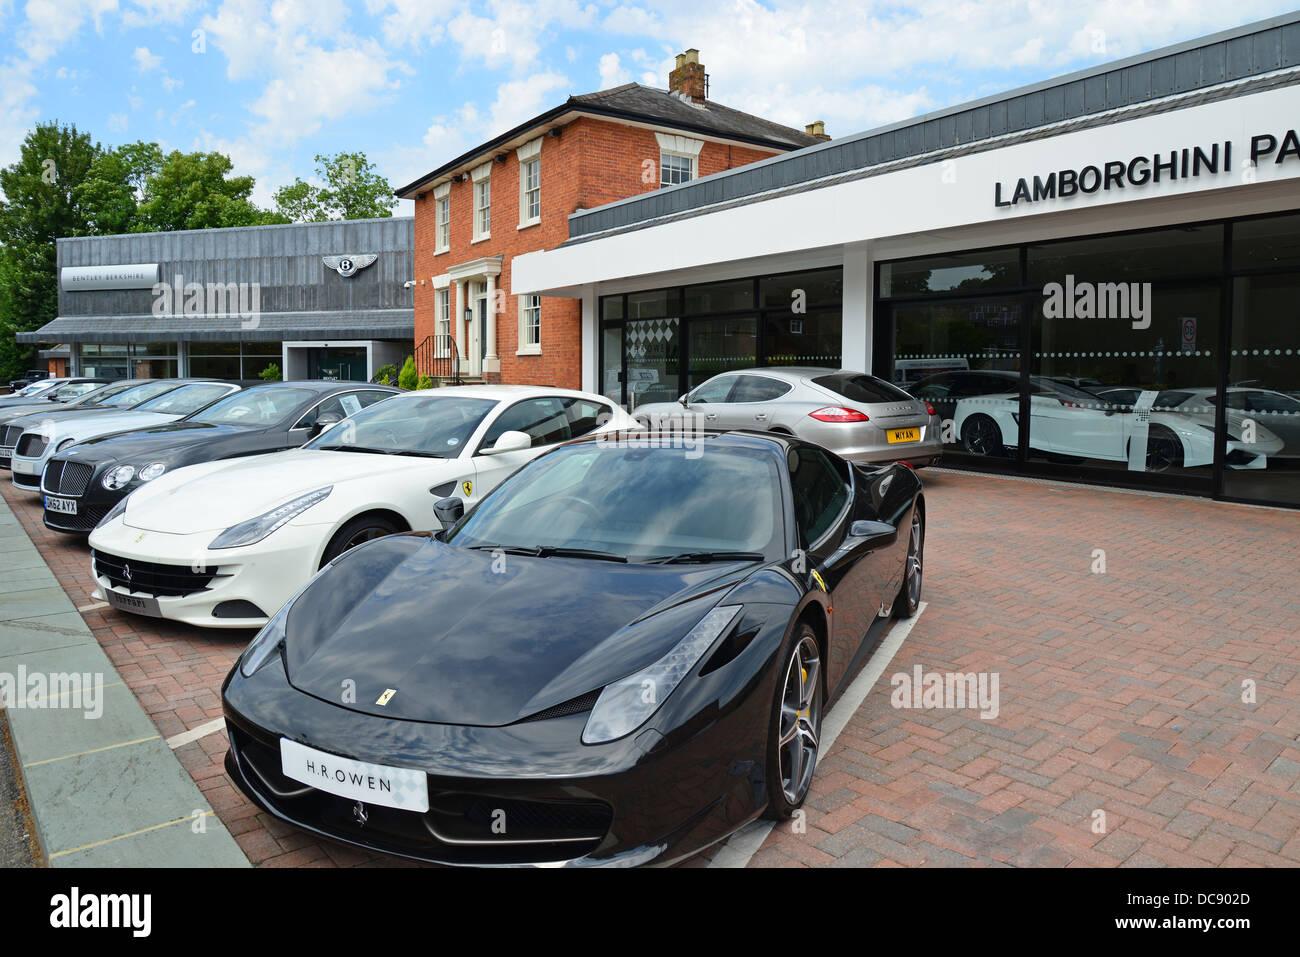 Hr owen group lamborghini pangbourne car dealers station for Garage bourny automobiles laval